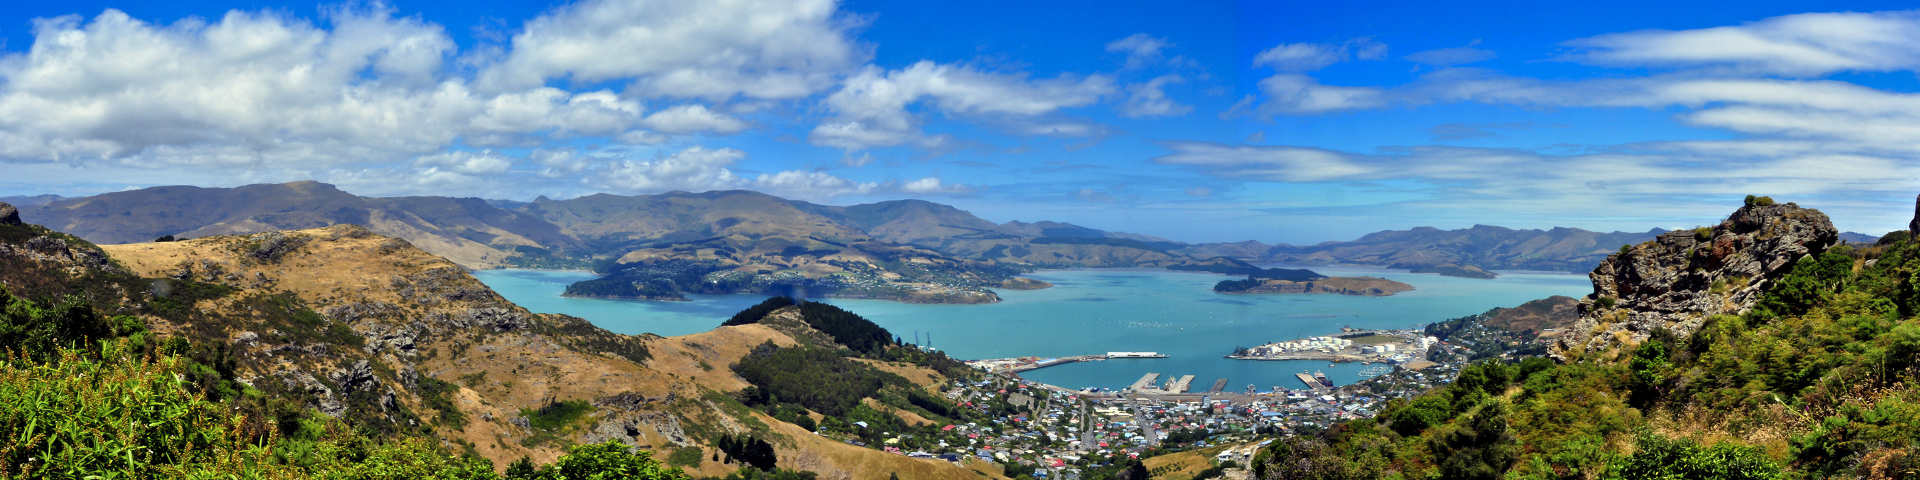 Christchurch hero banner1